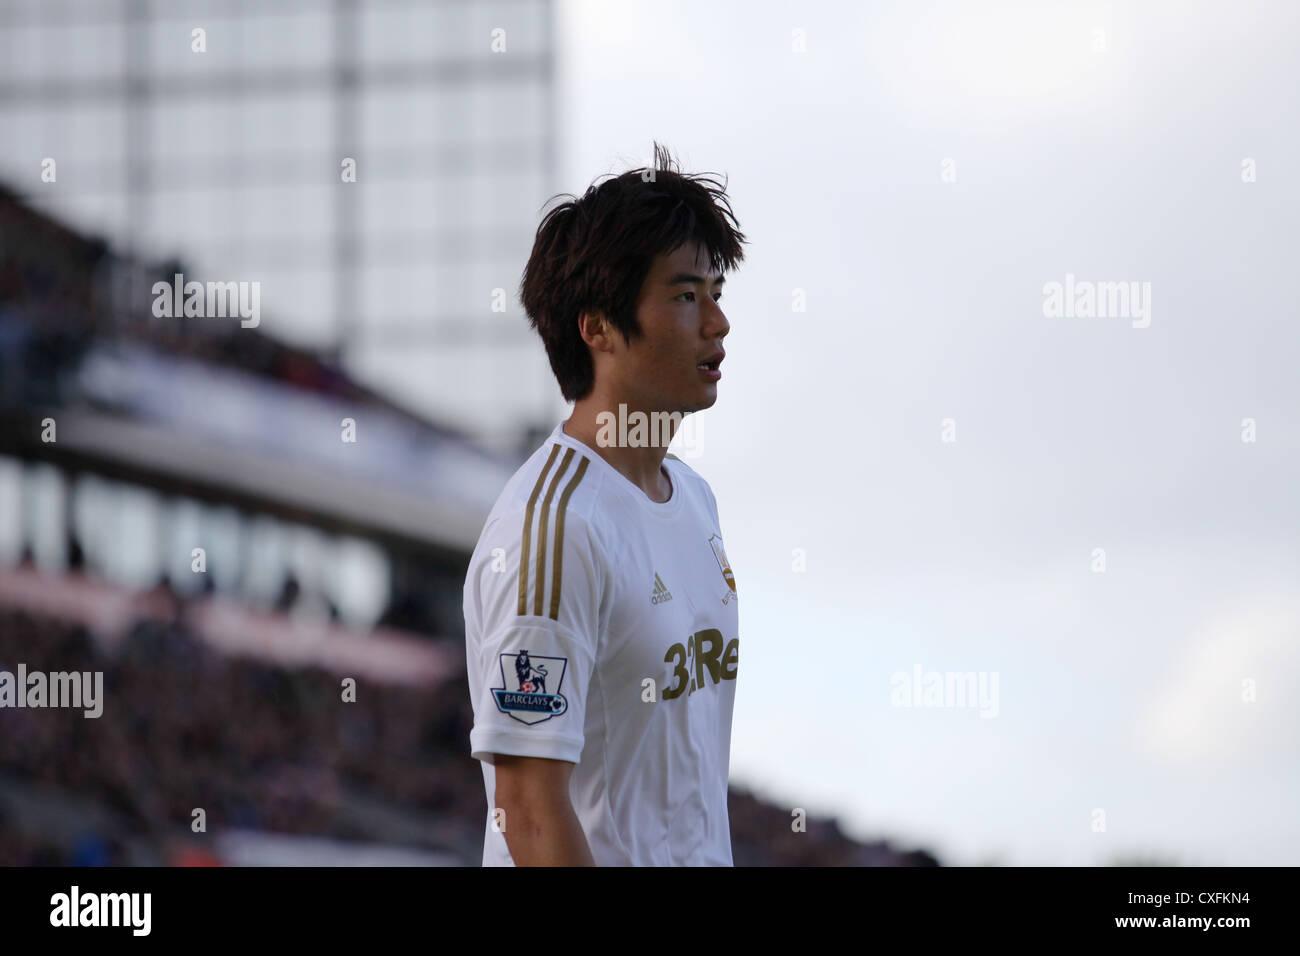 Ki Sung-Yeung, Barclays Premier League, Stoke City V Swansea, Britannia Stadium, 29/09/12 - Stock Image